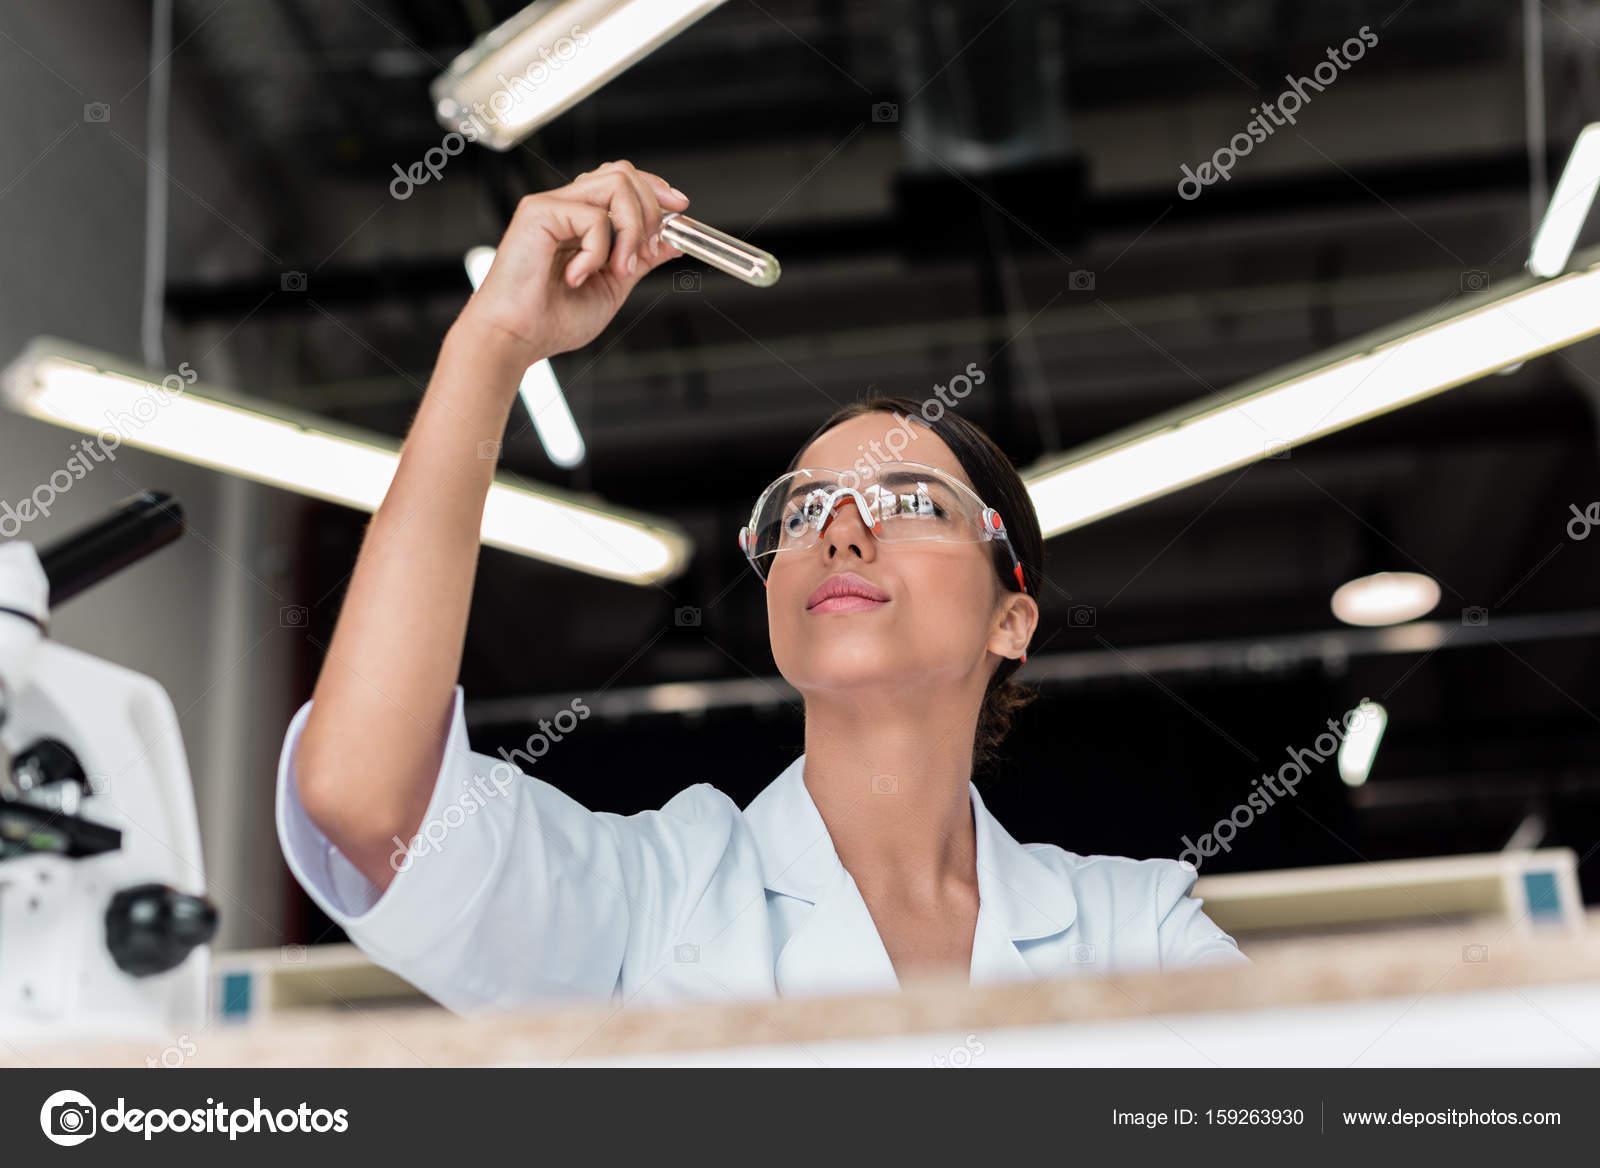 ec7ce8912c Επαγγελματική νεαρό επιστήμονα σε προστατευτικά γυαλιά κρατώντας σωλήνα  δοκιμής στο εργαστήριο — Εικόνα από ...